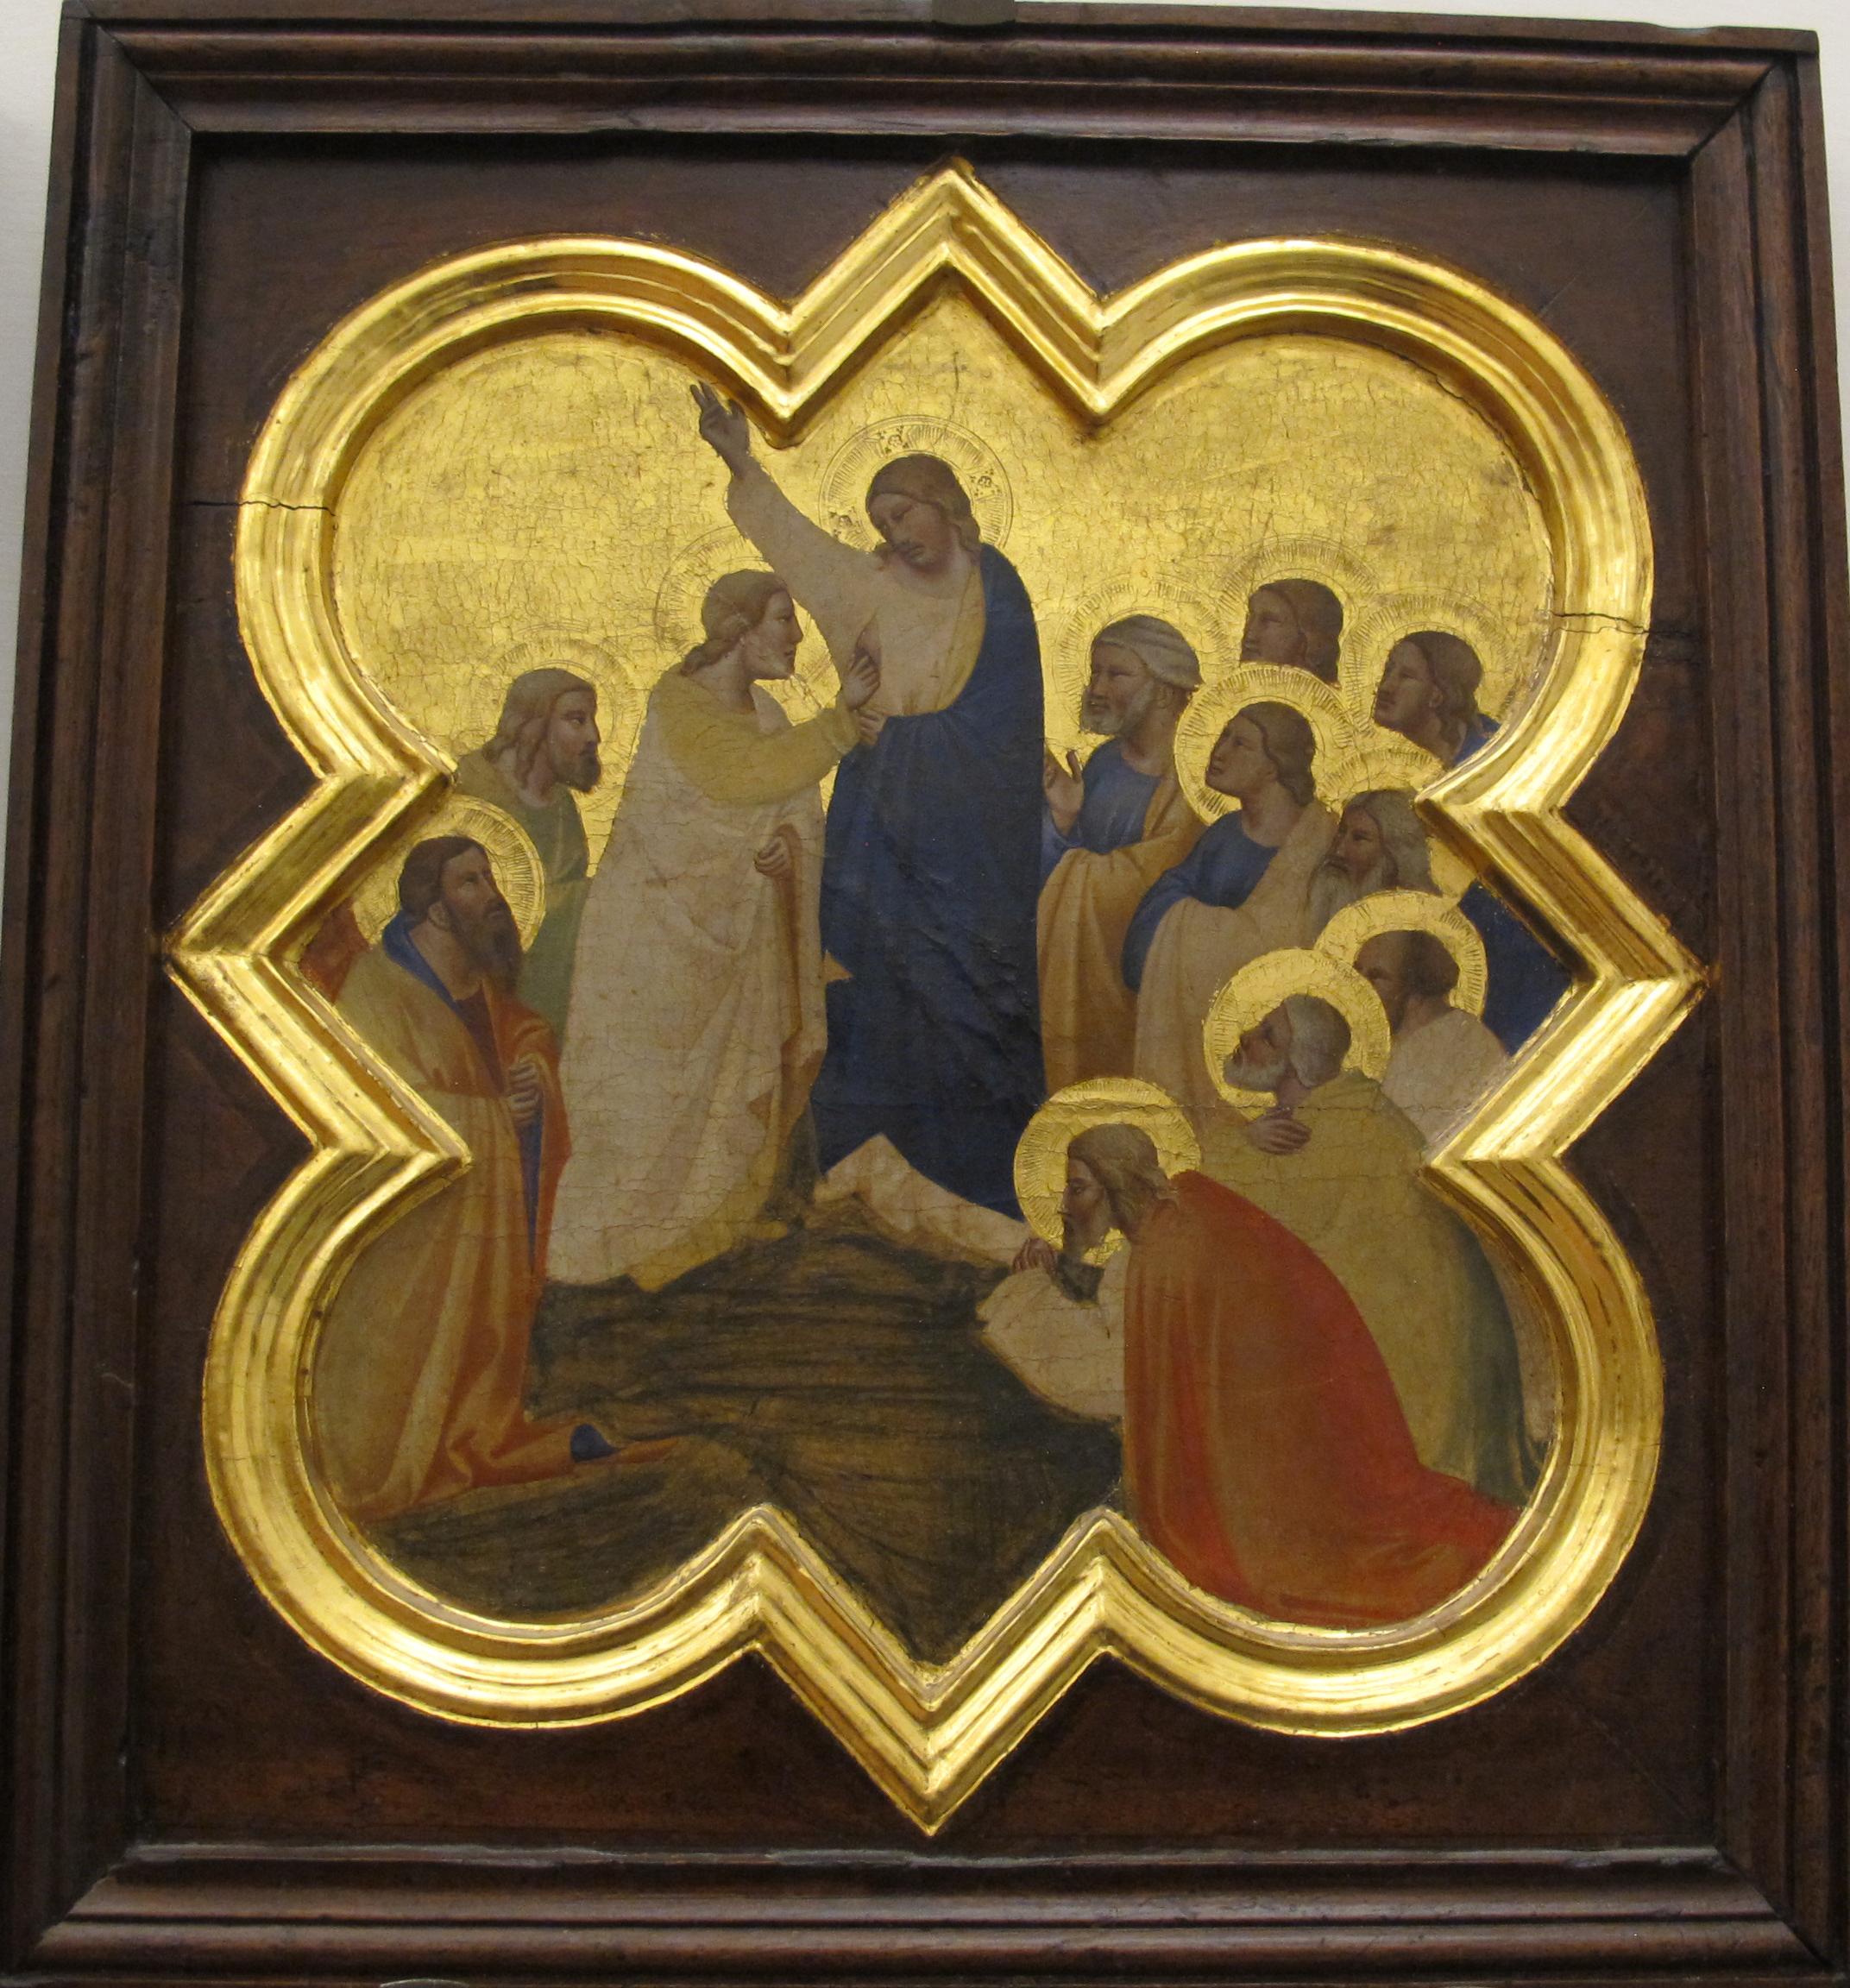 Taddeo Gaddi, armadio di s.croce,1335-40